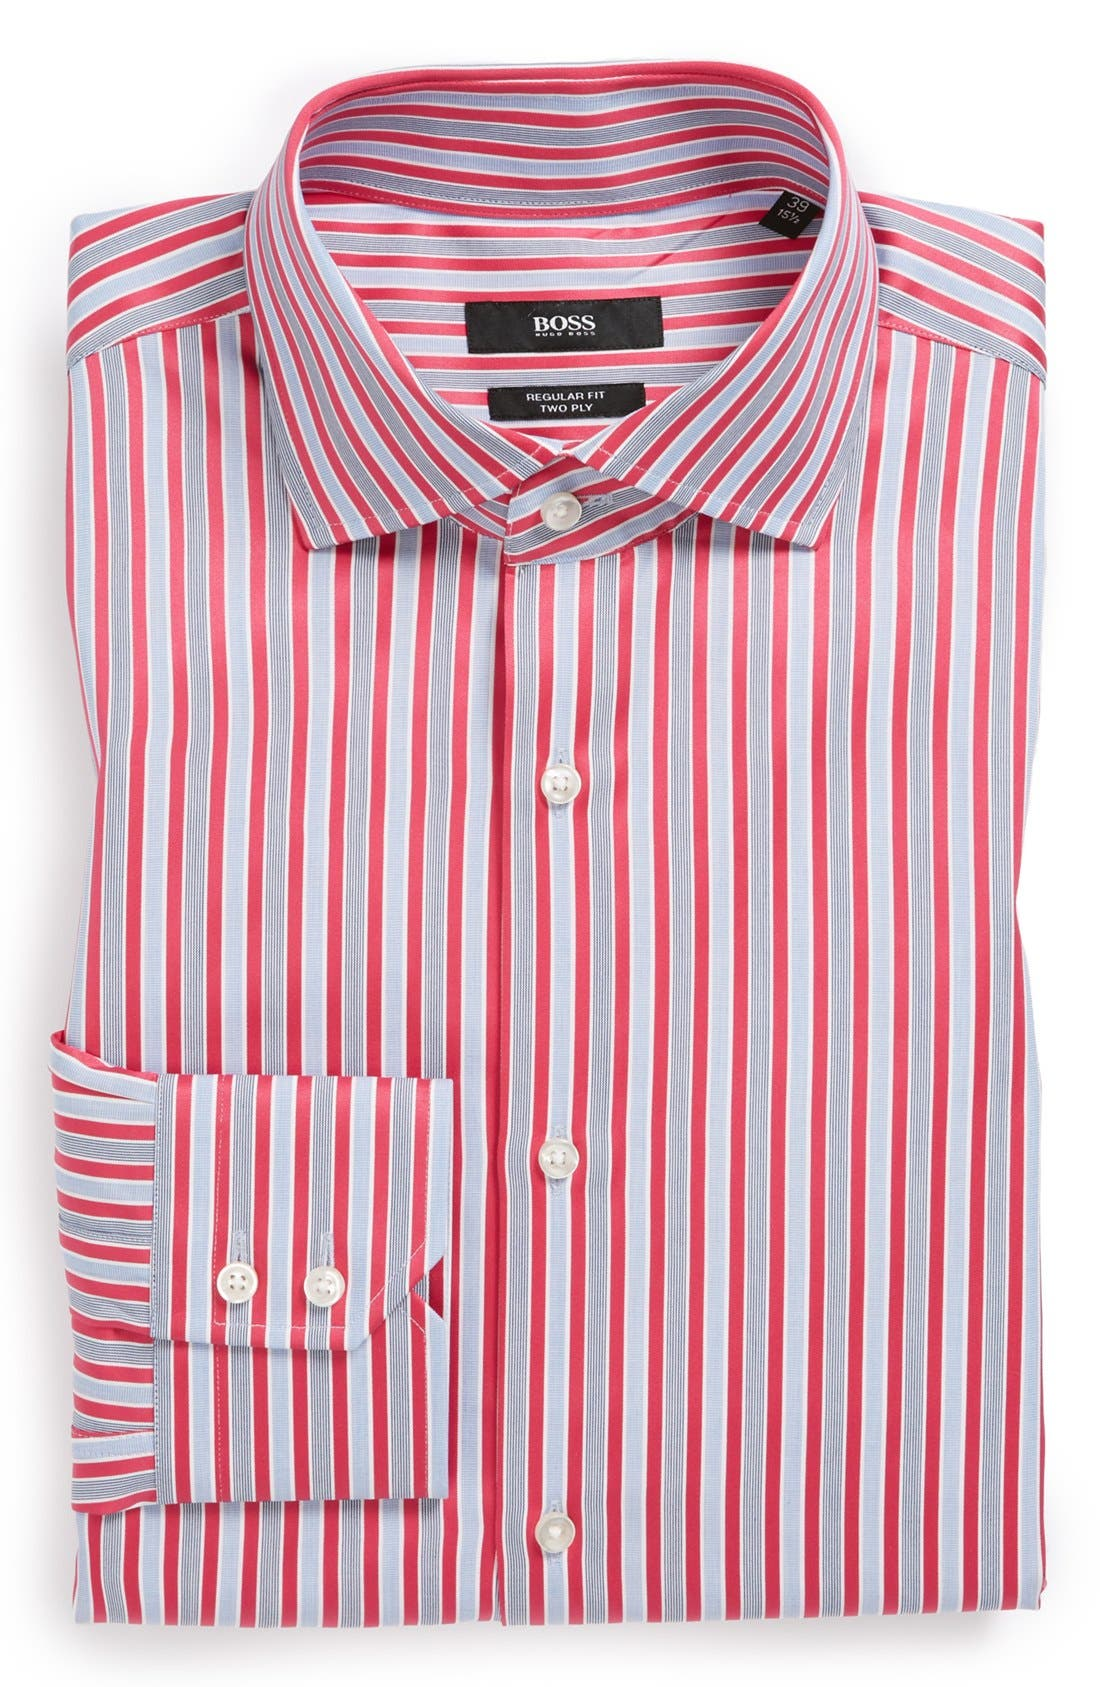 Alternate Image 1 Selected - BOSS HUGO BOSS 'Gerald' WW Regular Fit Dress Shirt